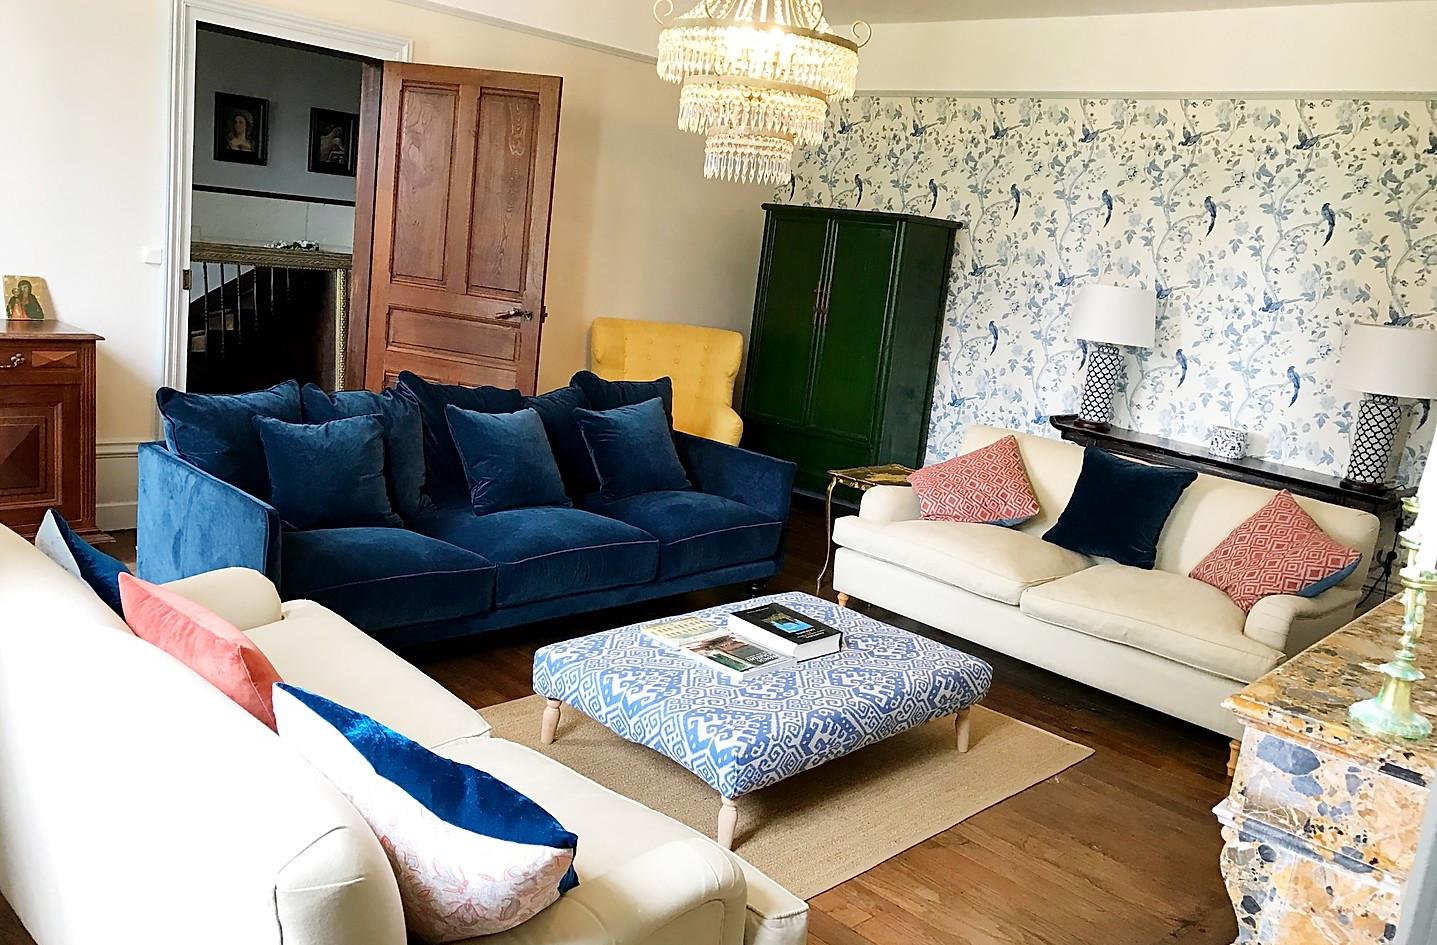 Maison_Sitting Room.jpg